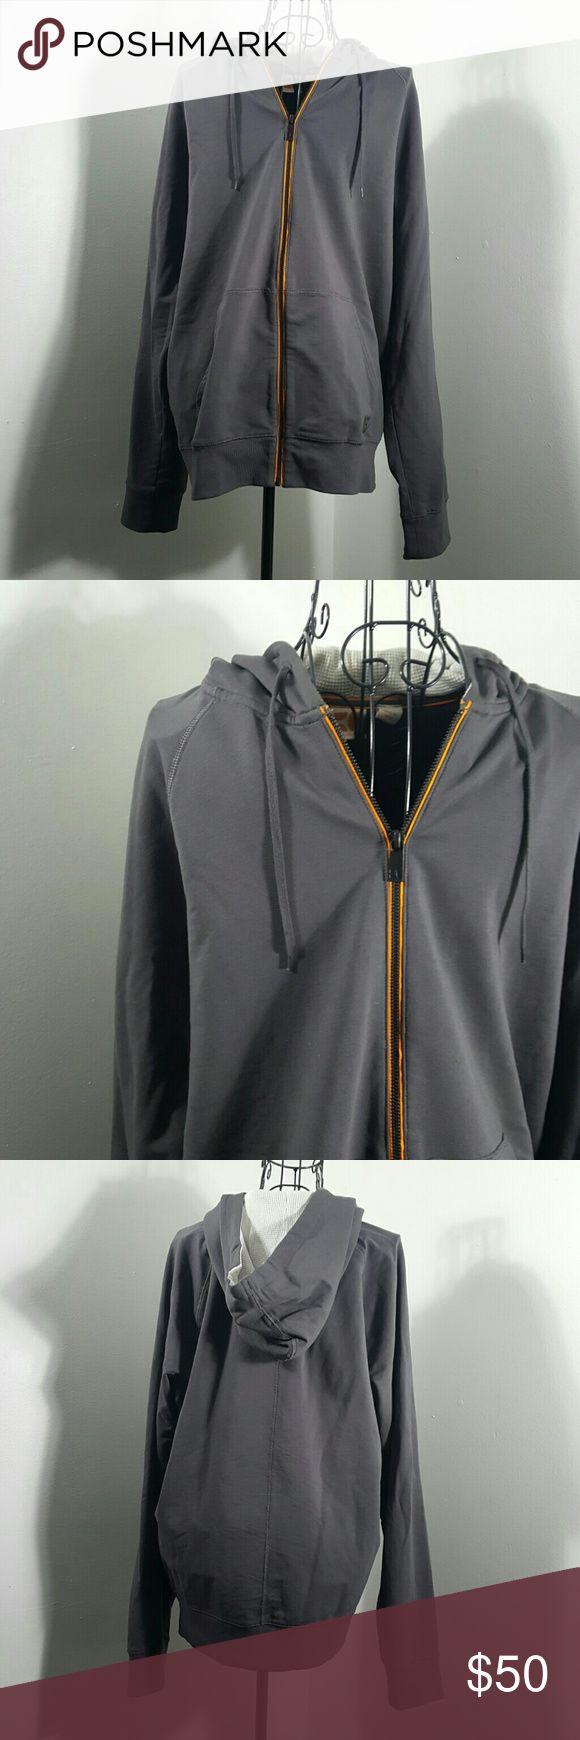 HUGO BOSS ORANGE HOODIE SWEATSHIRT HUGO BOSS ORANGE GOOD CONDITION SUPER COMFORTABLE STYLE LUXURY WEALTH Hugo Boss Shirts Sweatshirts & Hoodies